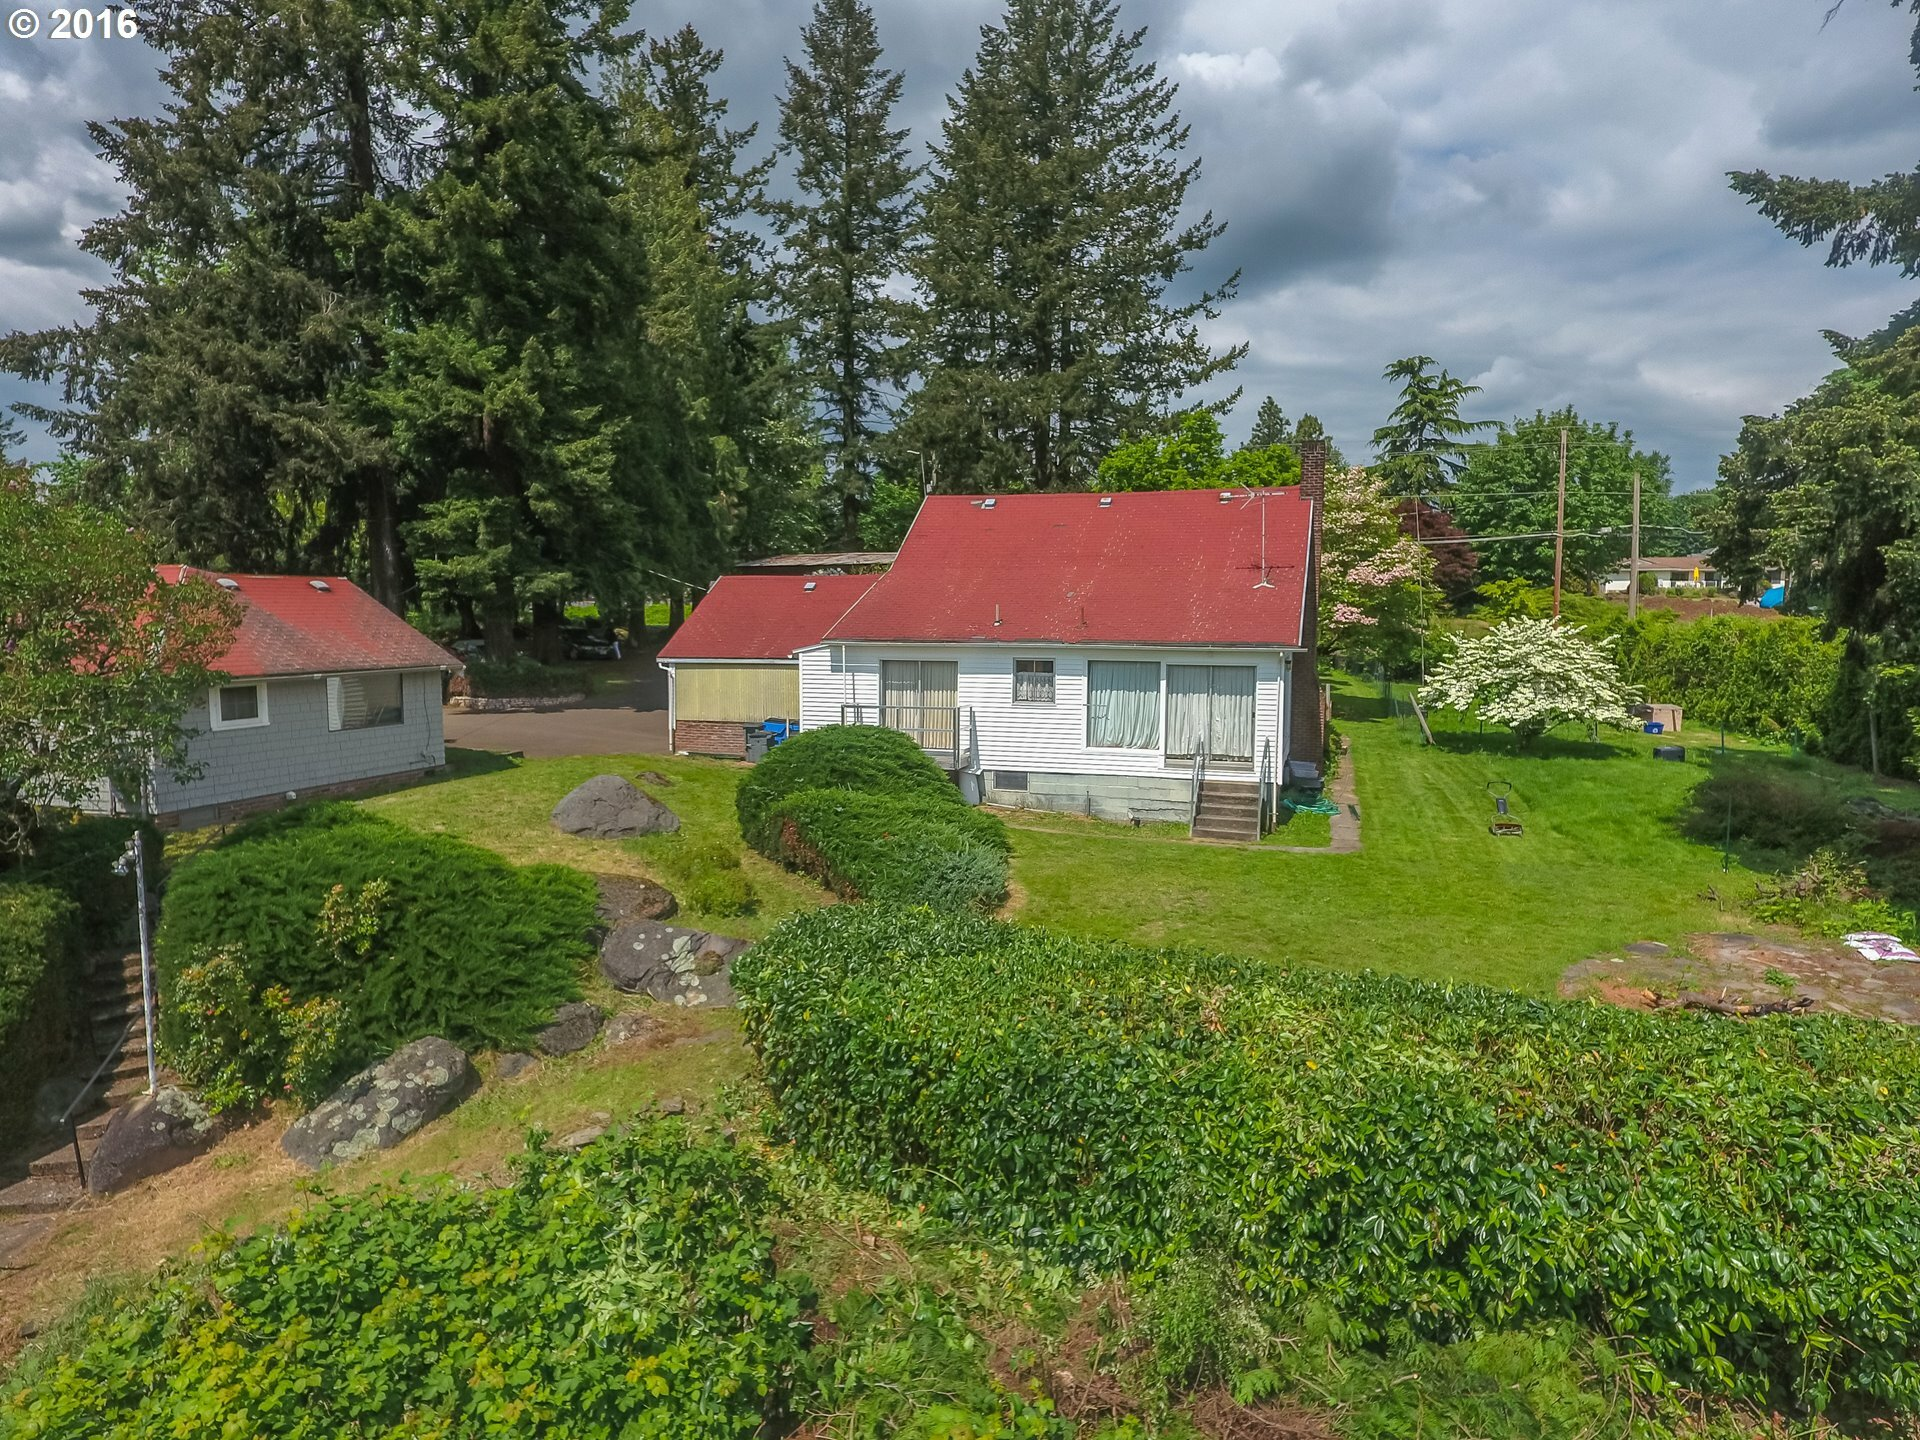 15613 Se Evergreen Hwy, Vancouver, WA - USA (photo 1)